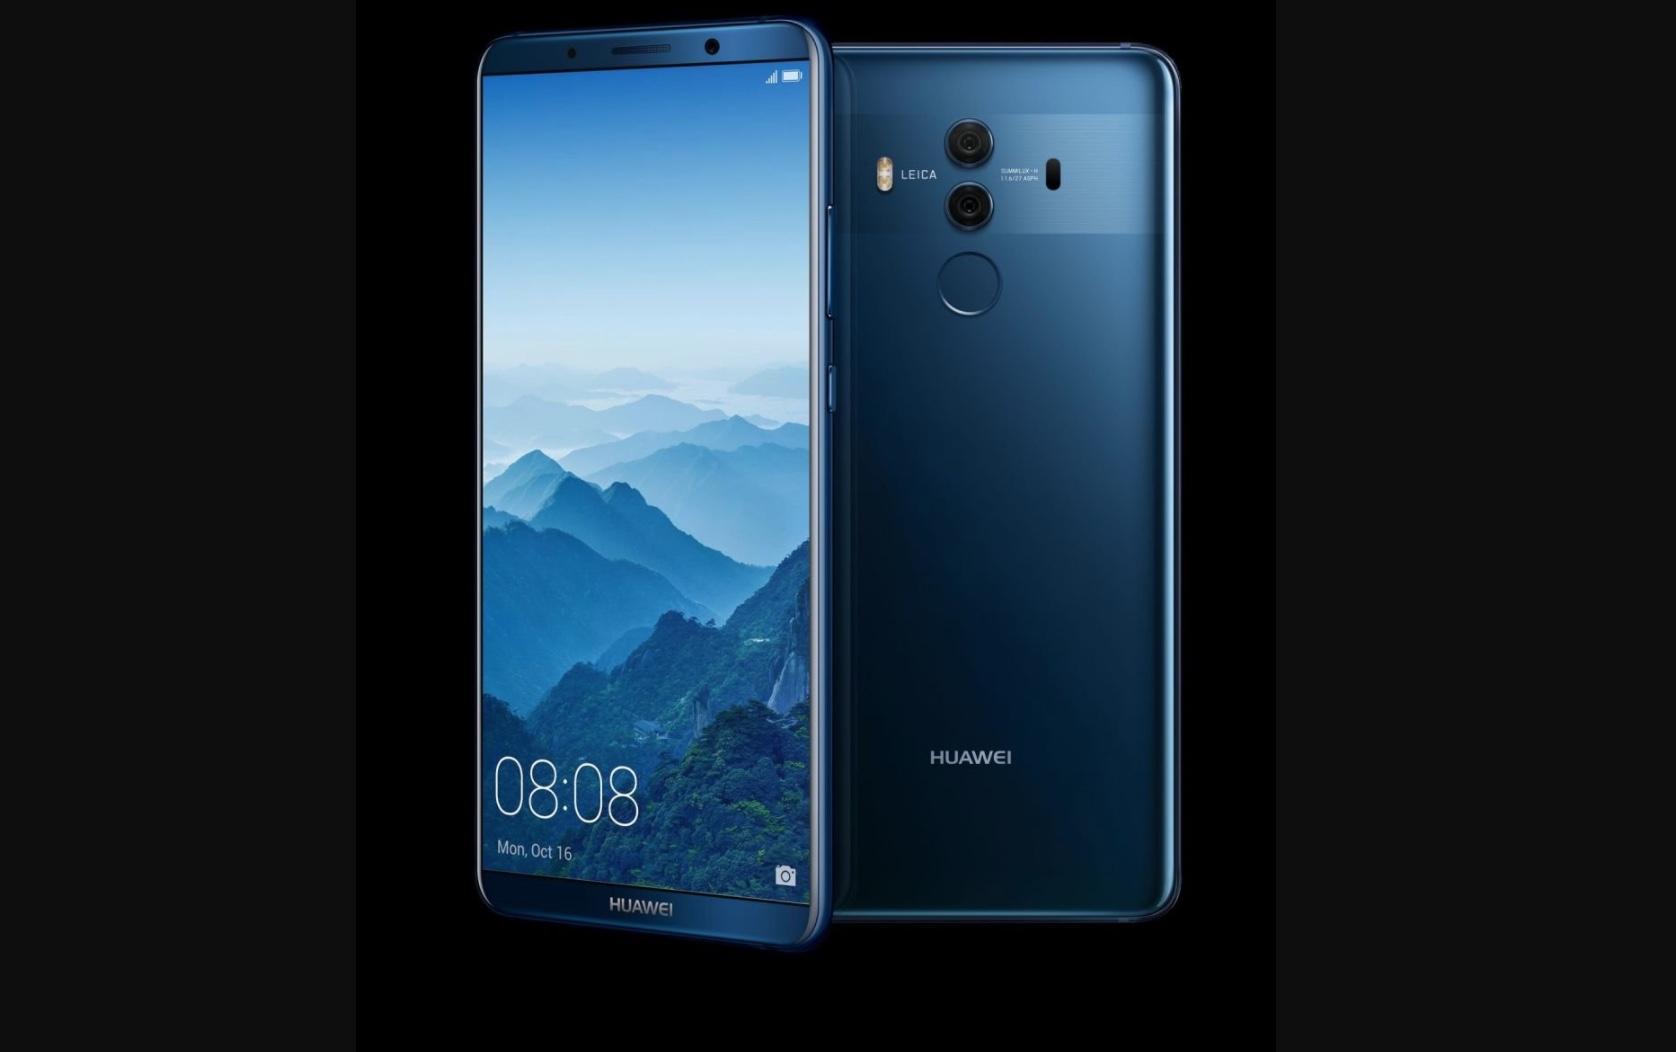 Schemi Elettrici Huawei : Huawei mate 10 pro: in italia il primo kirin 970 data manager online